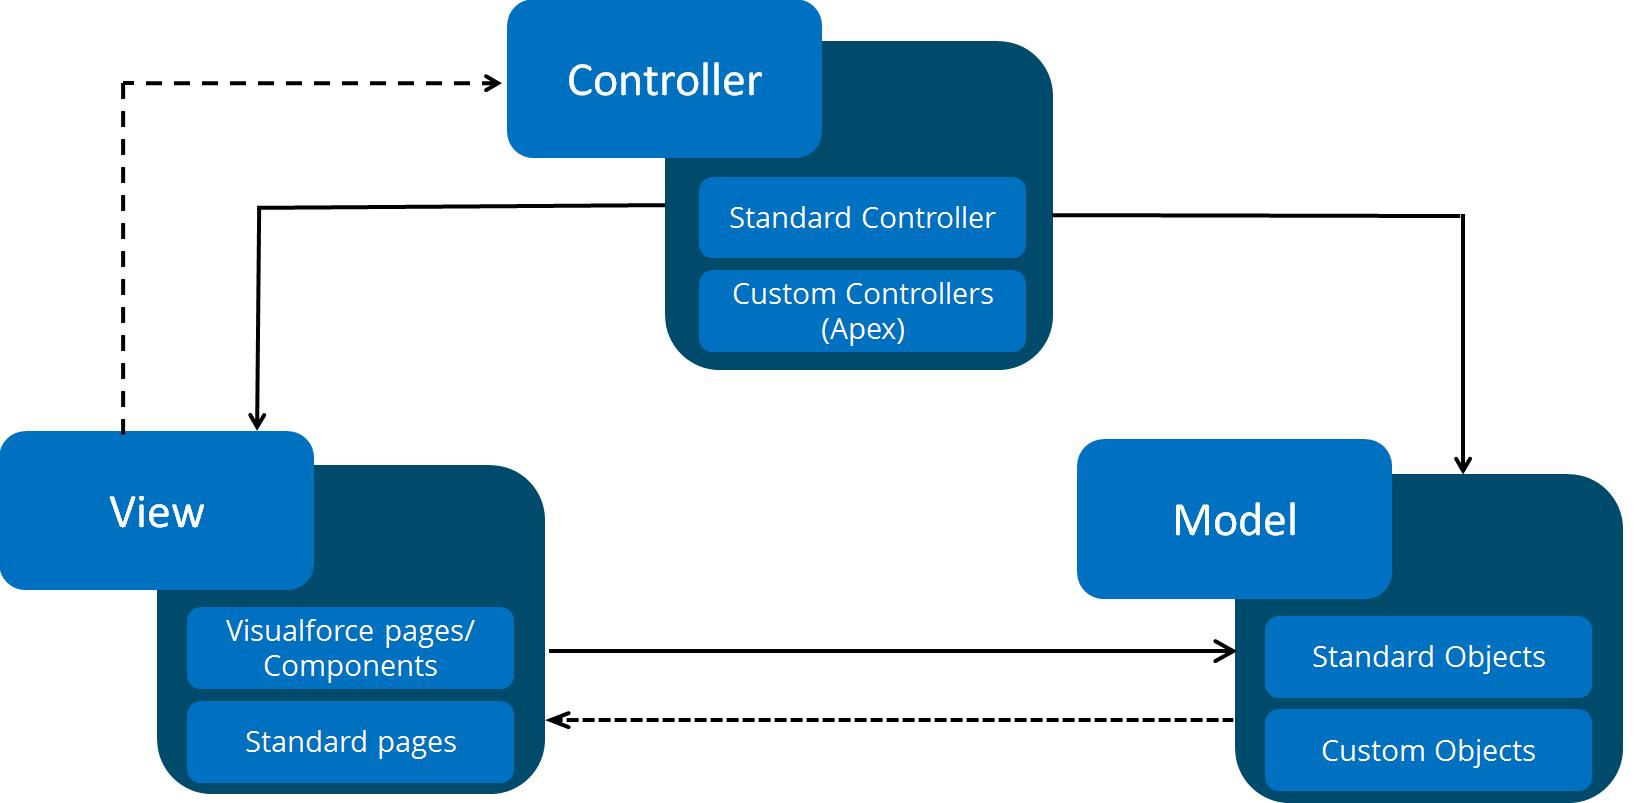 mvc struts architecture diagram ford flathead firing order salesforce developer tutorial get started with